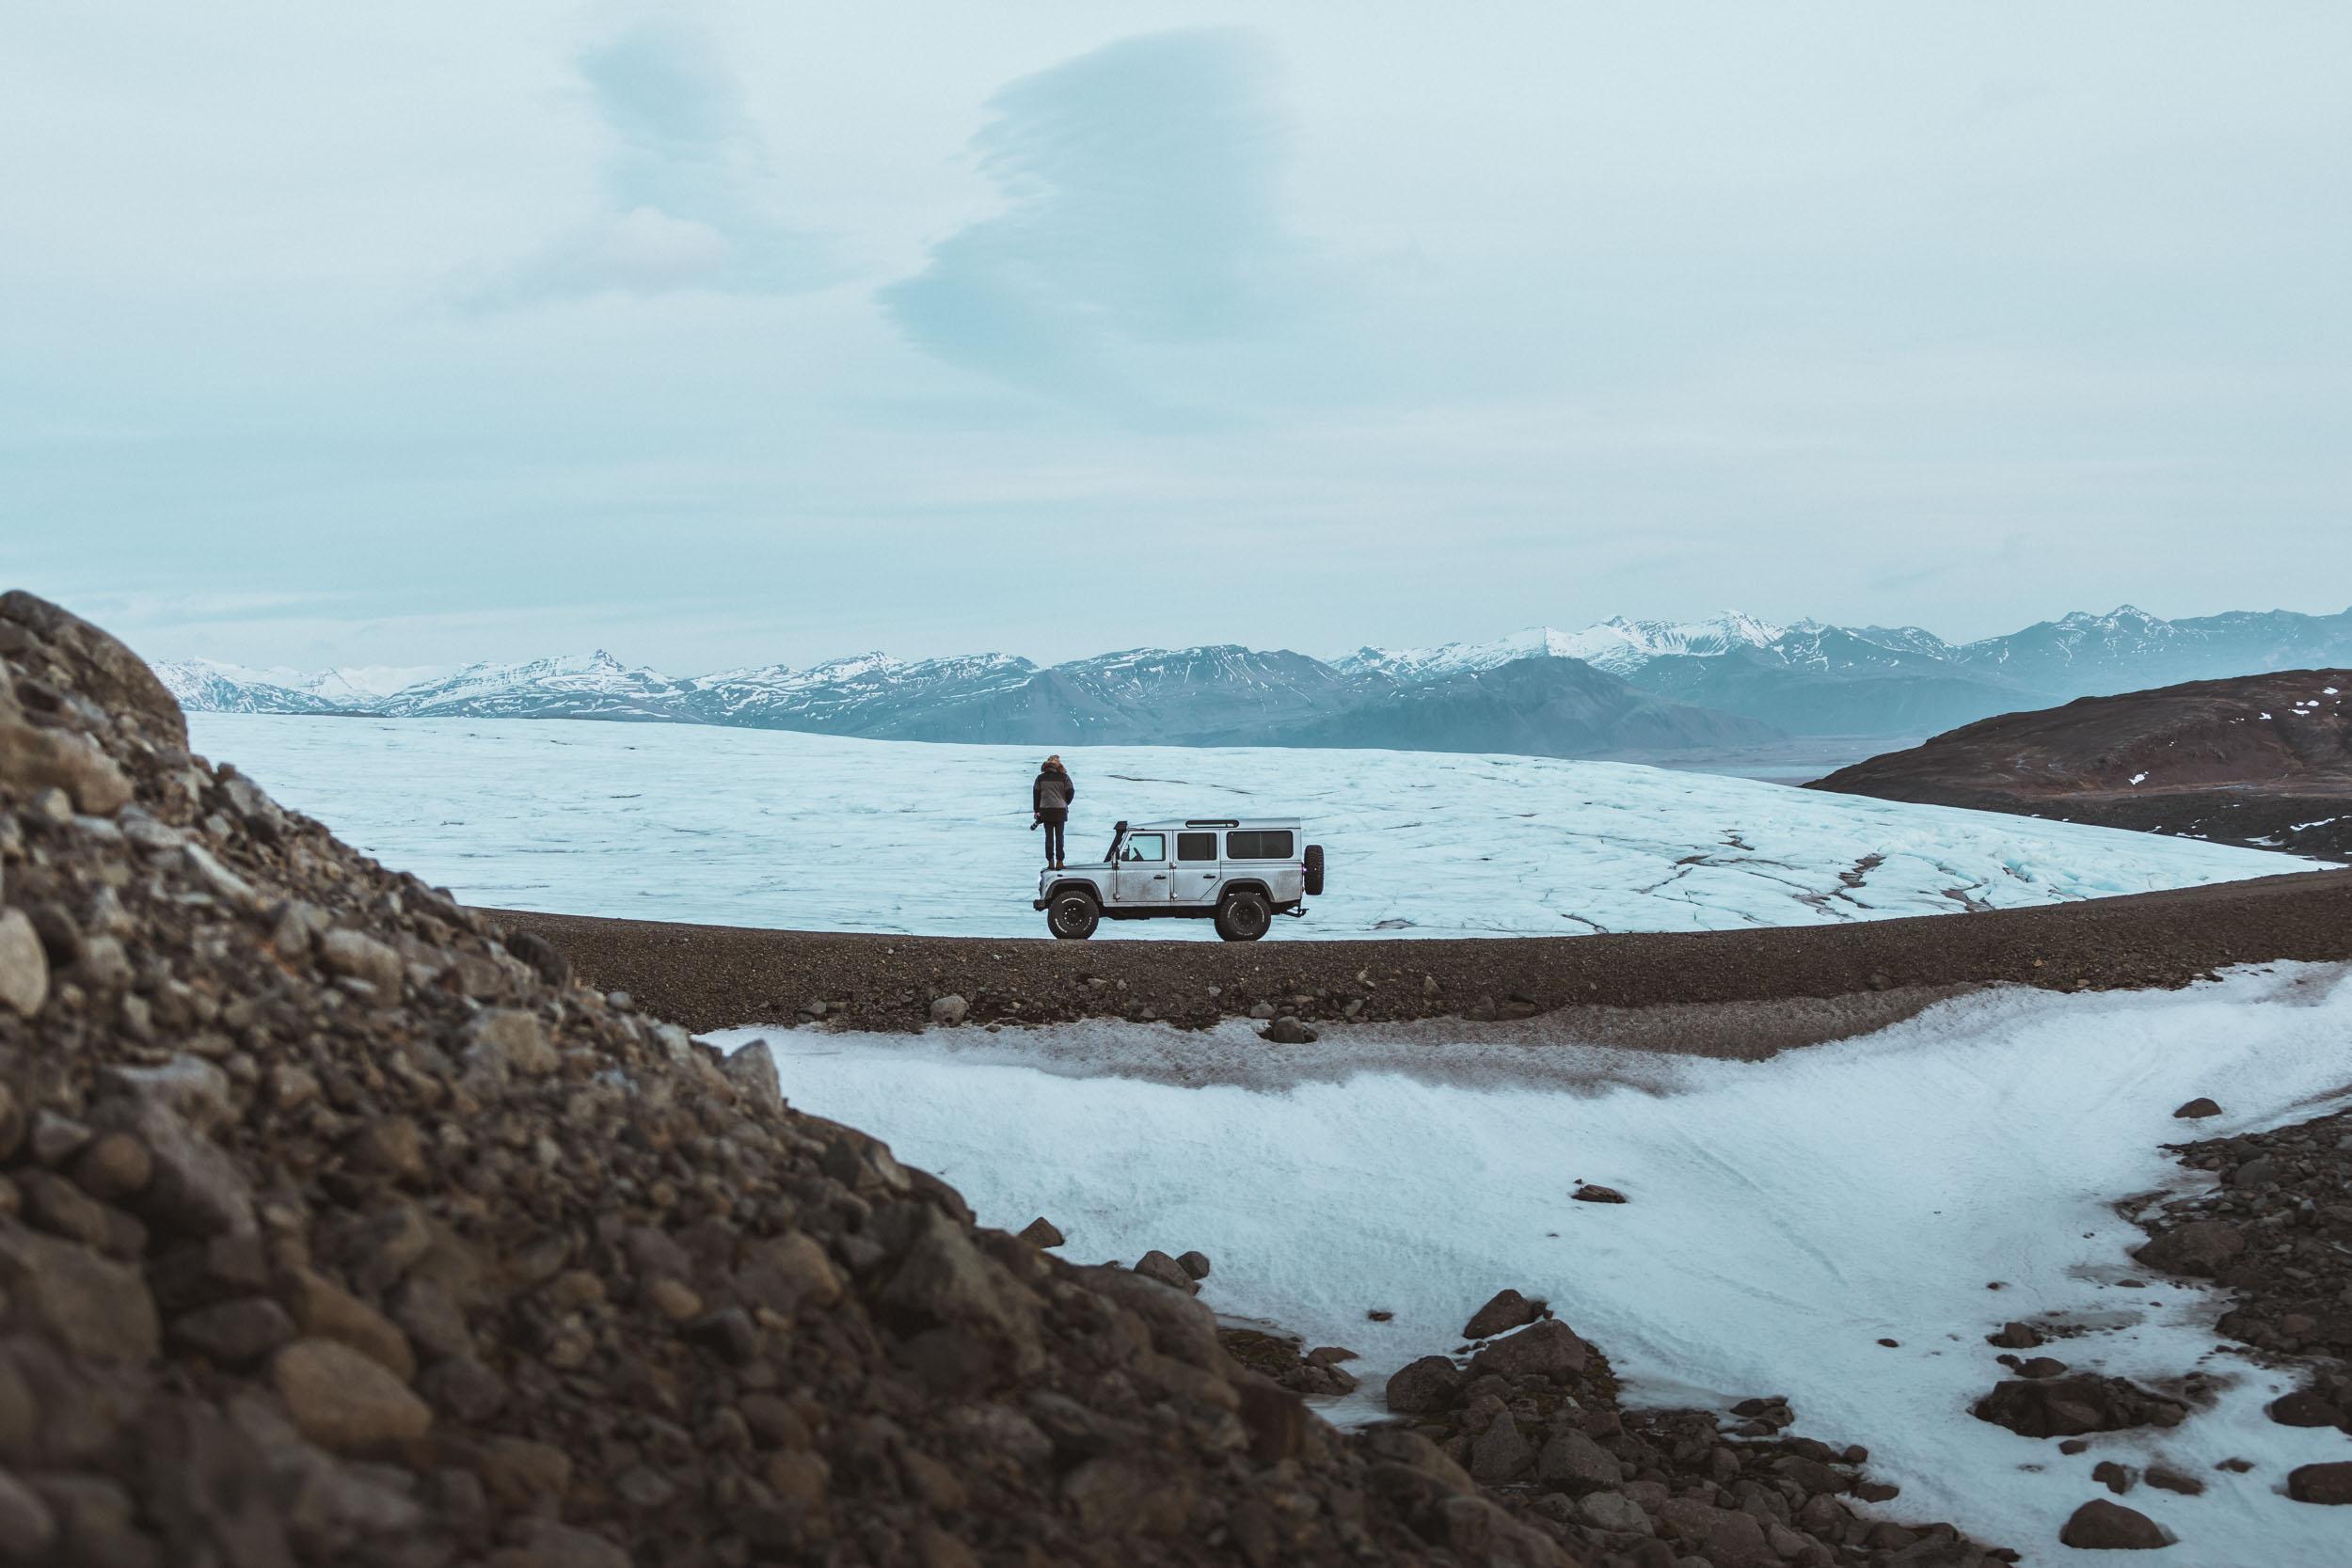 Iceland_Jan_2019_ByTomKahler_Lowres (177 of 262).jpg